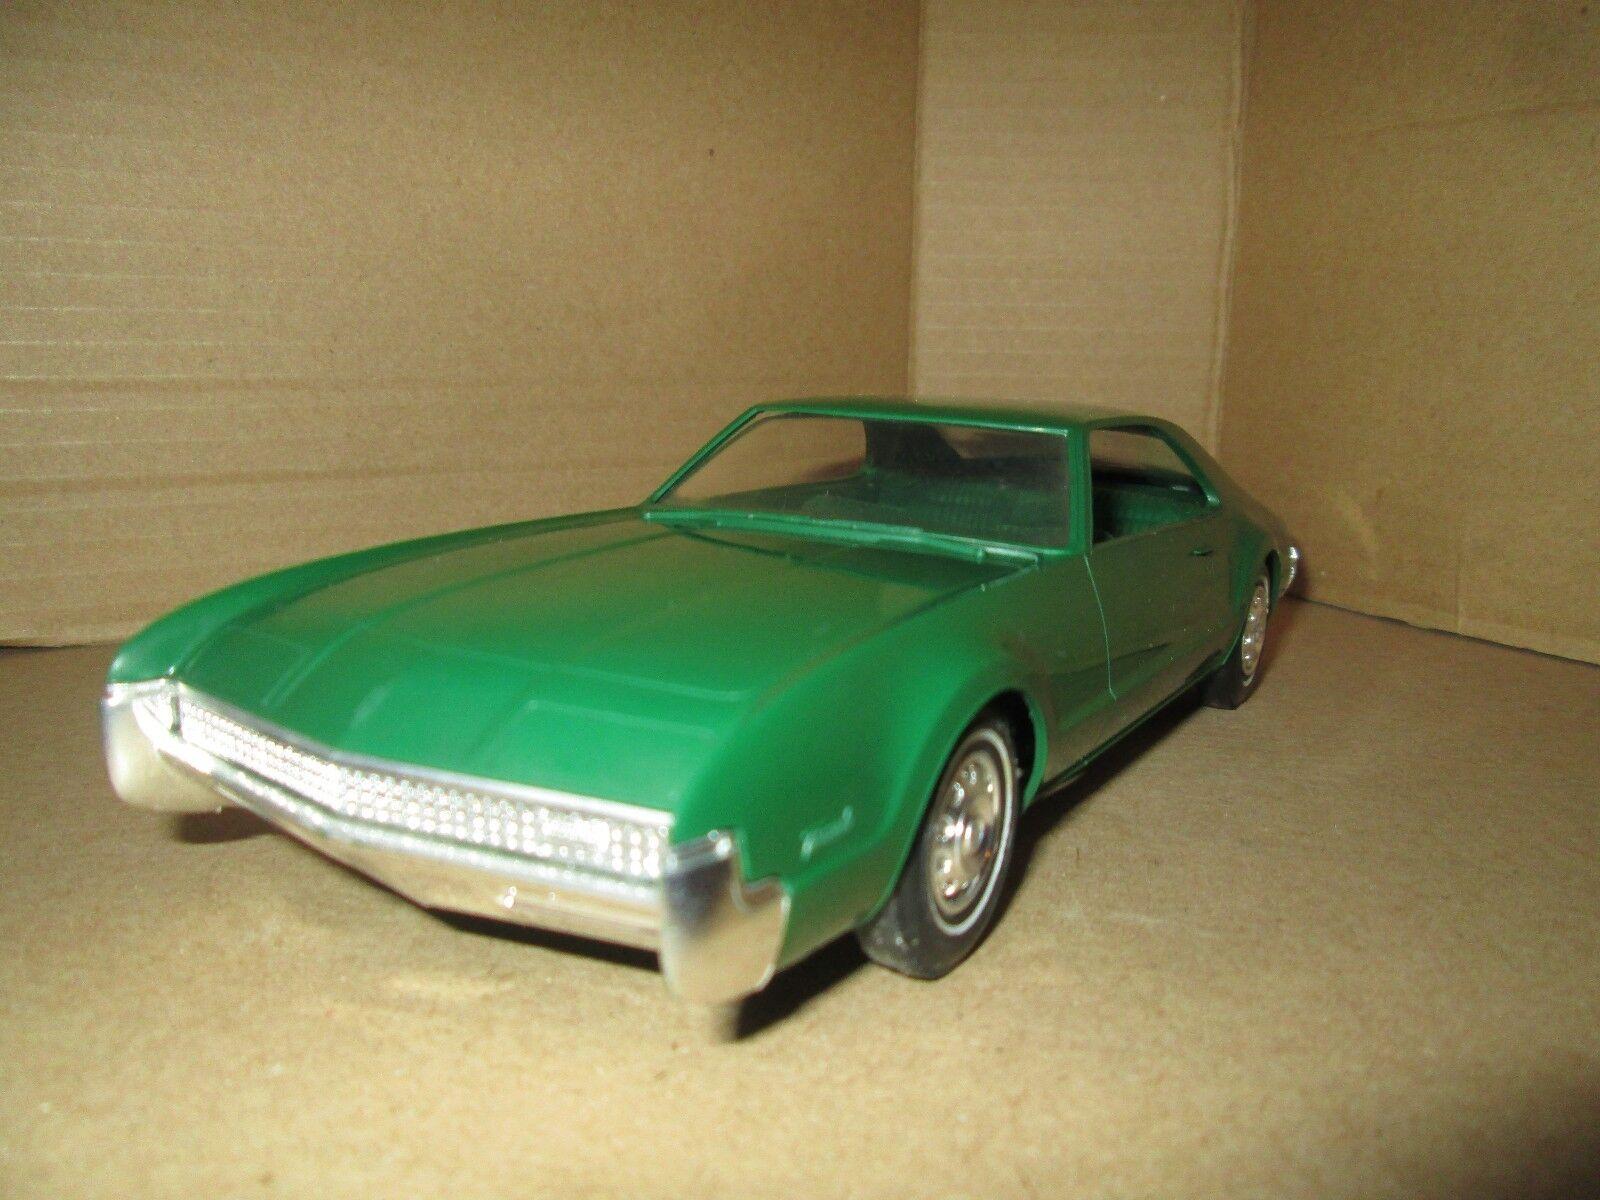 1967 Olsmobile Tornado Dealer Promo Pantalla Piezas 1 25 Loose Pantalla Pieza